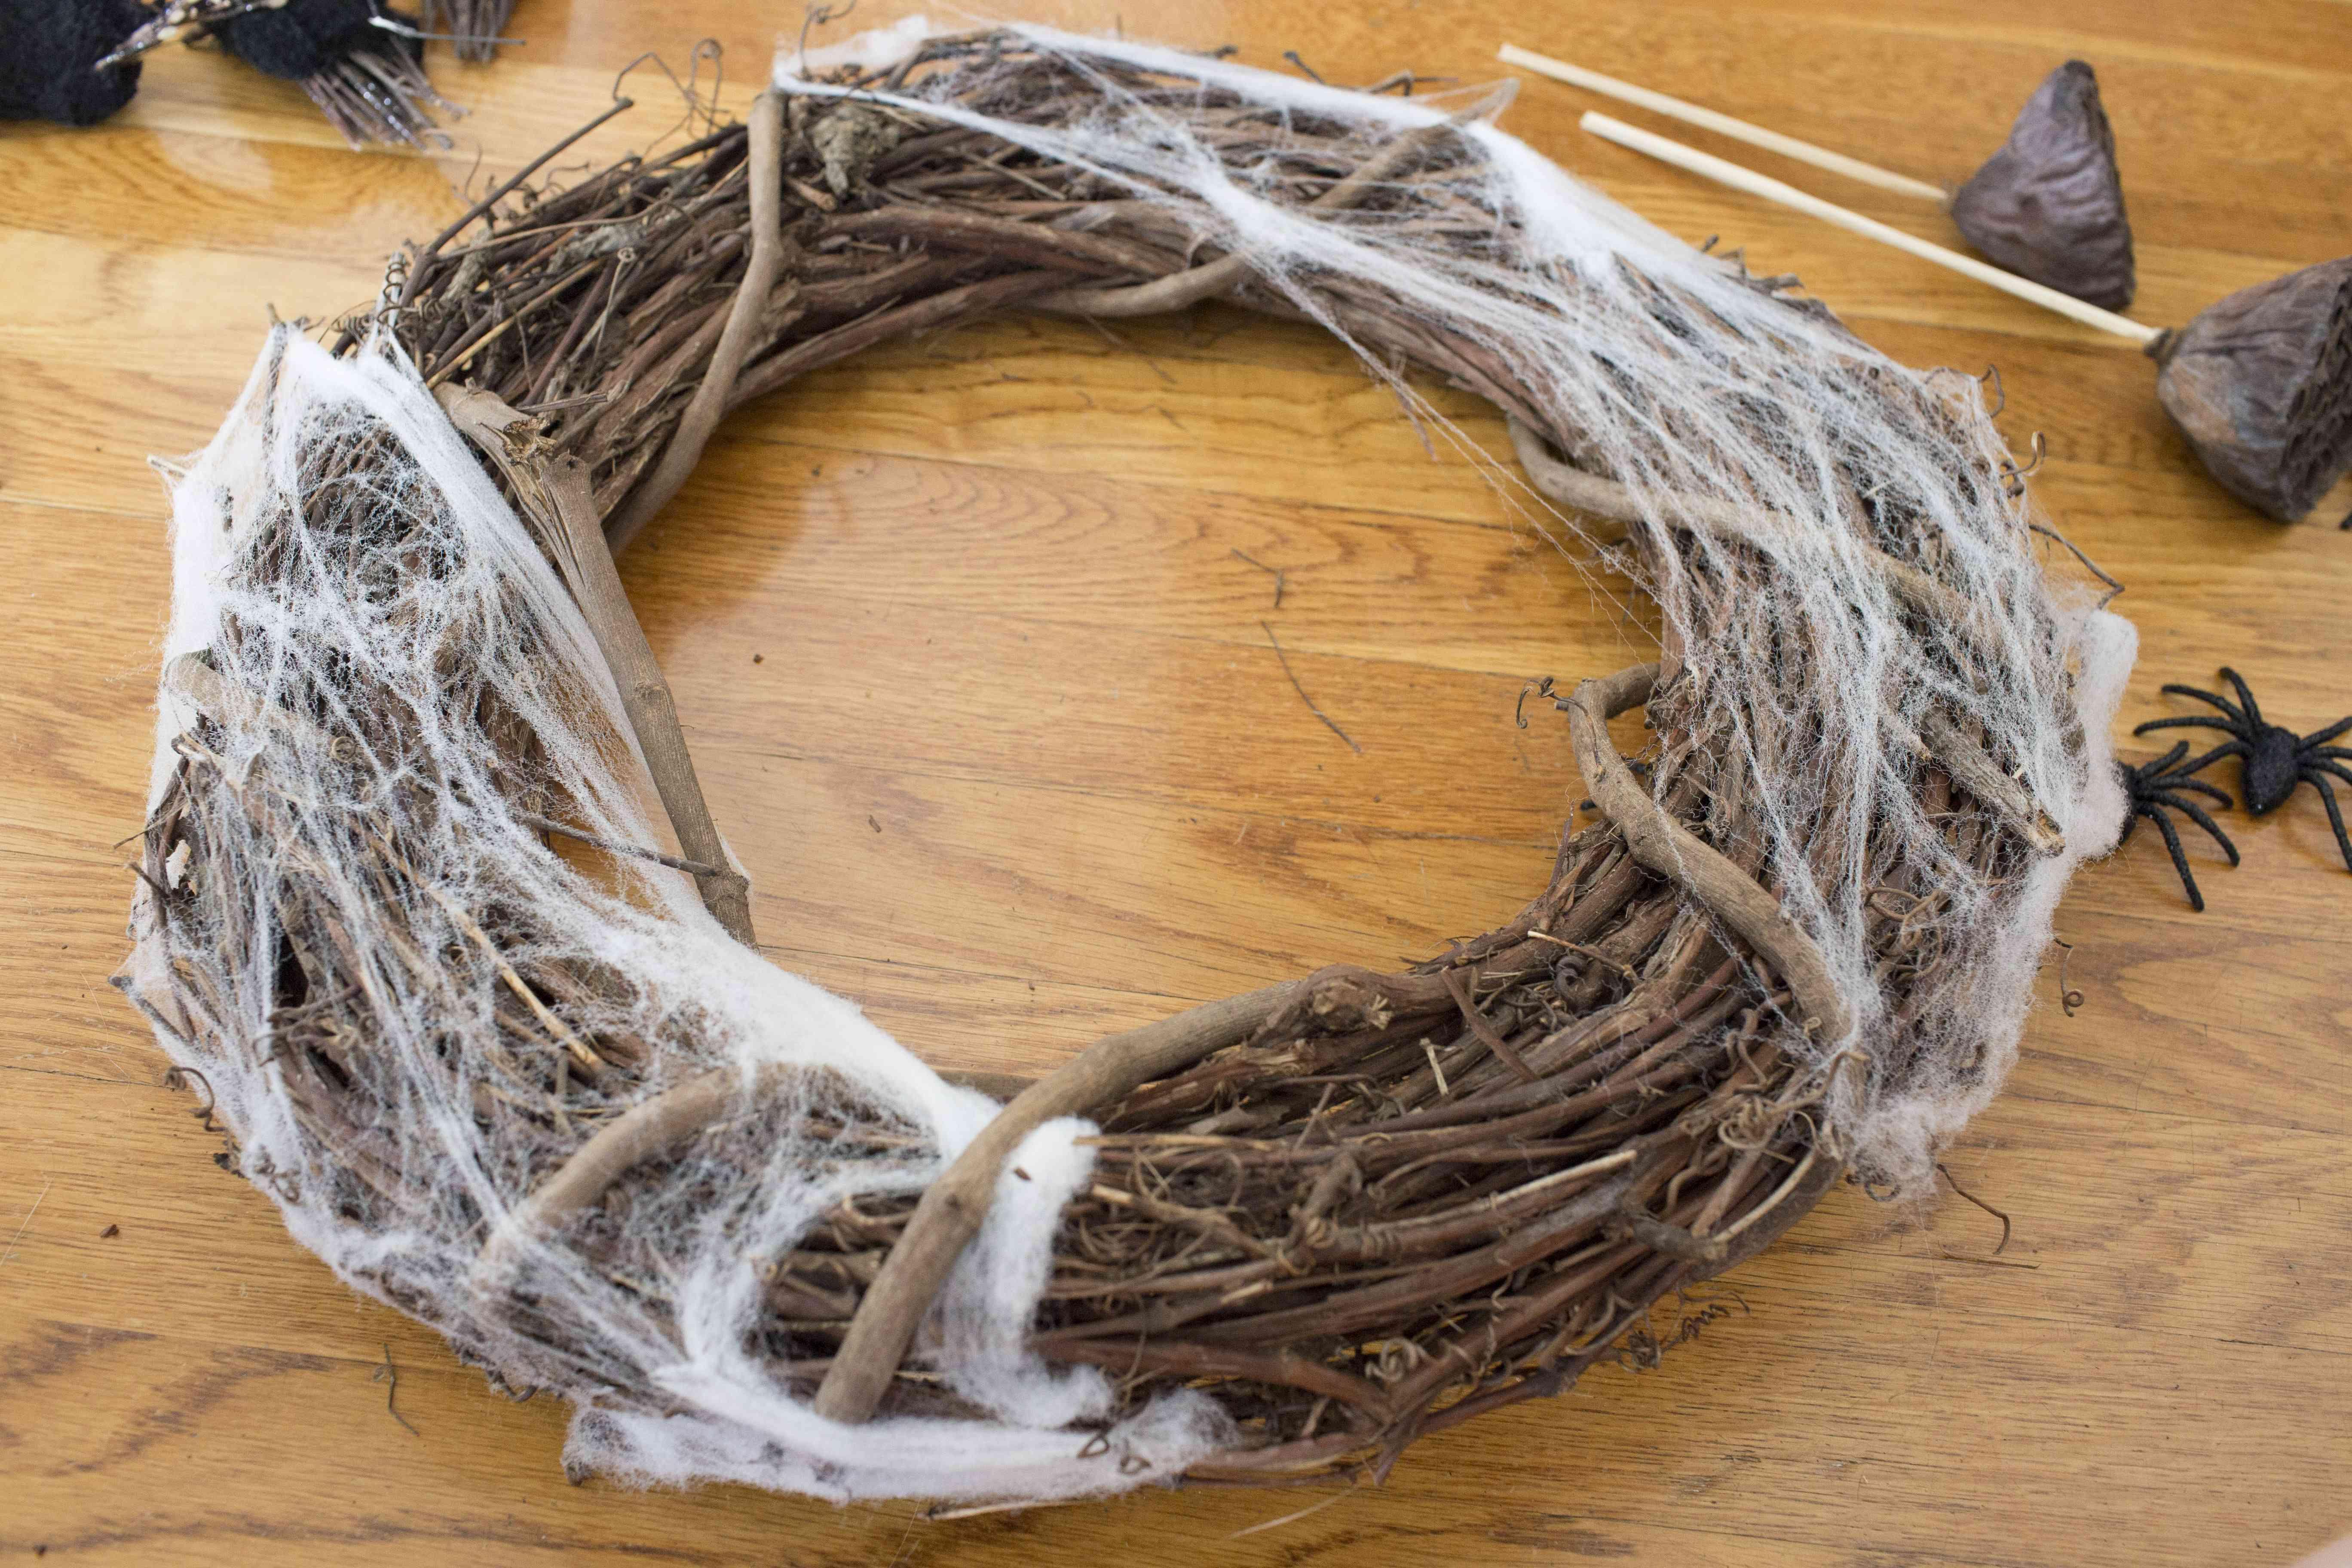 Add cobwebs to the wreath.